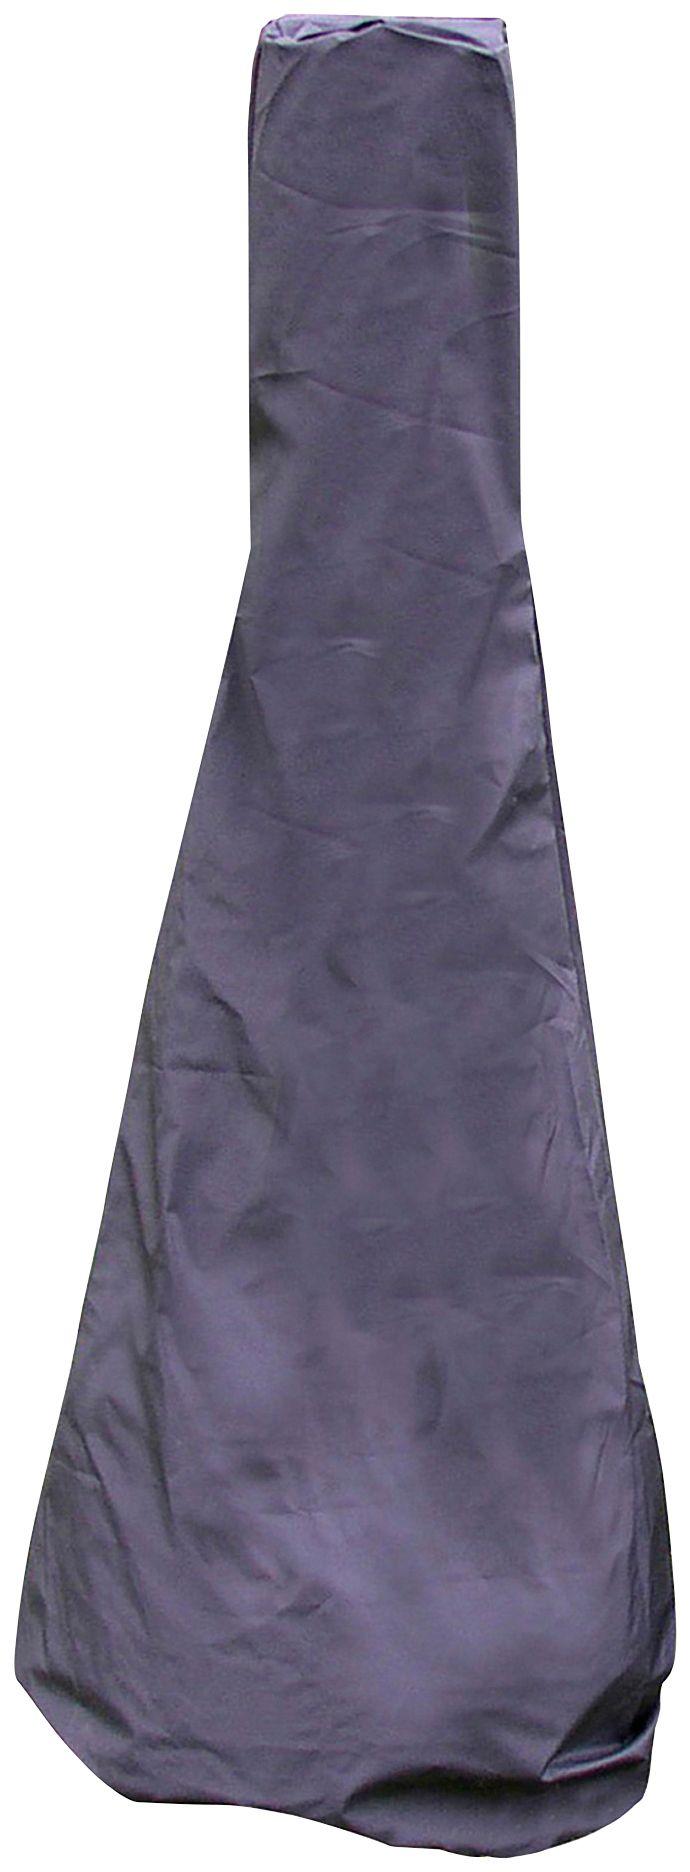 BUSCHBECK  Abdeckhaube »Colorado L«, B/T/H: 60/60/160 cm